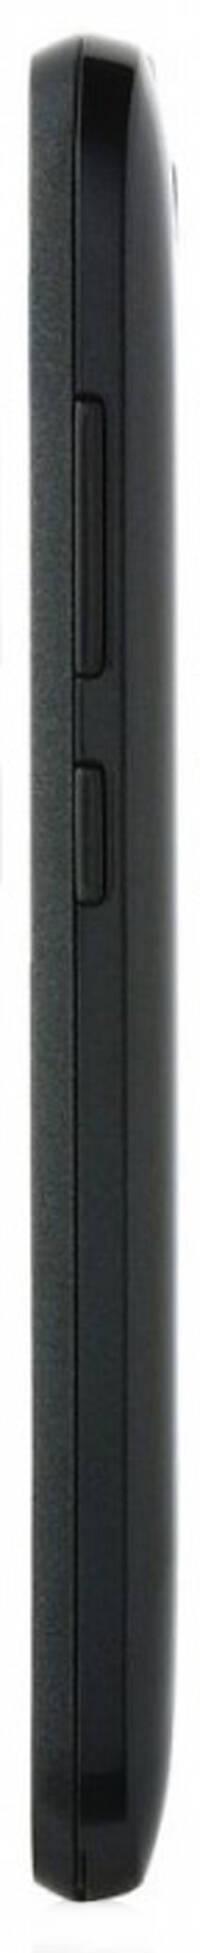 lenovo-ideaphone-a560-black-03.jpg